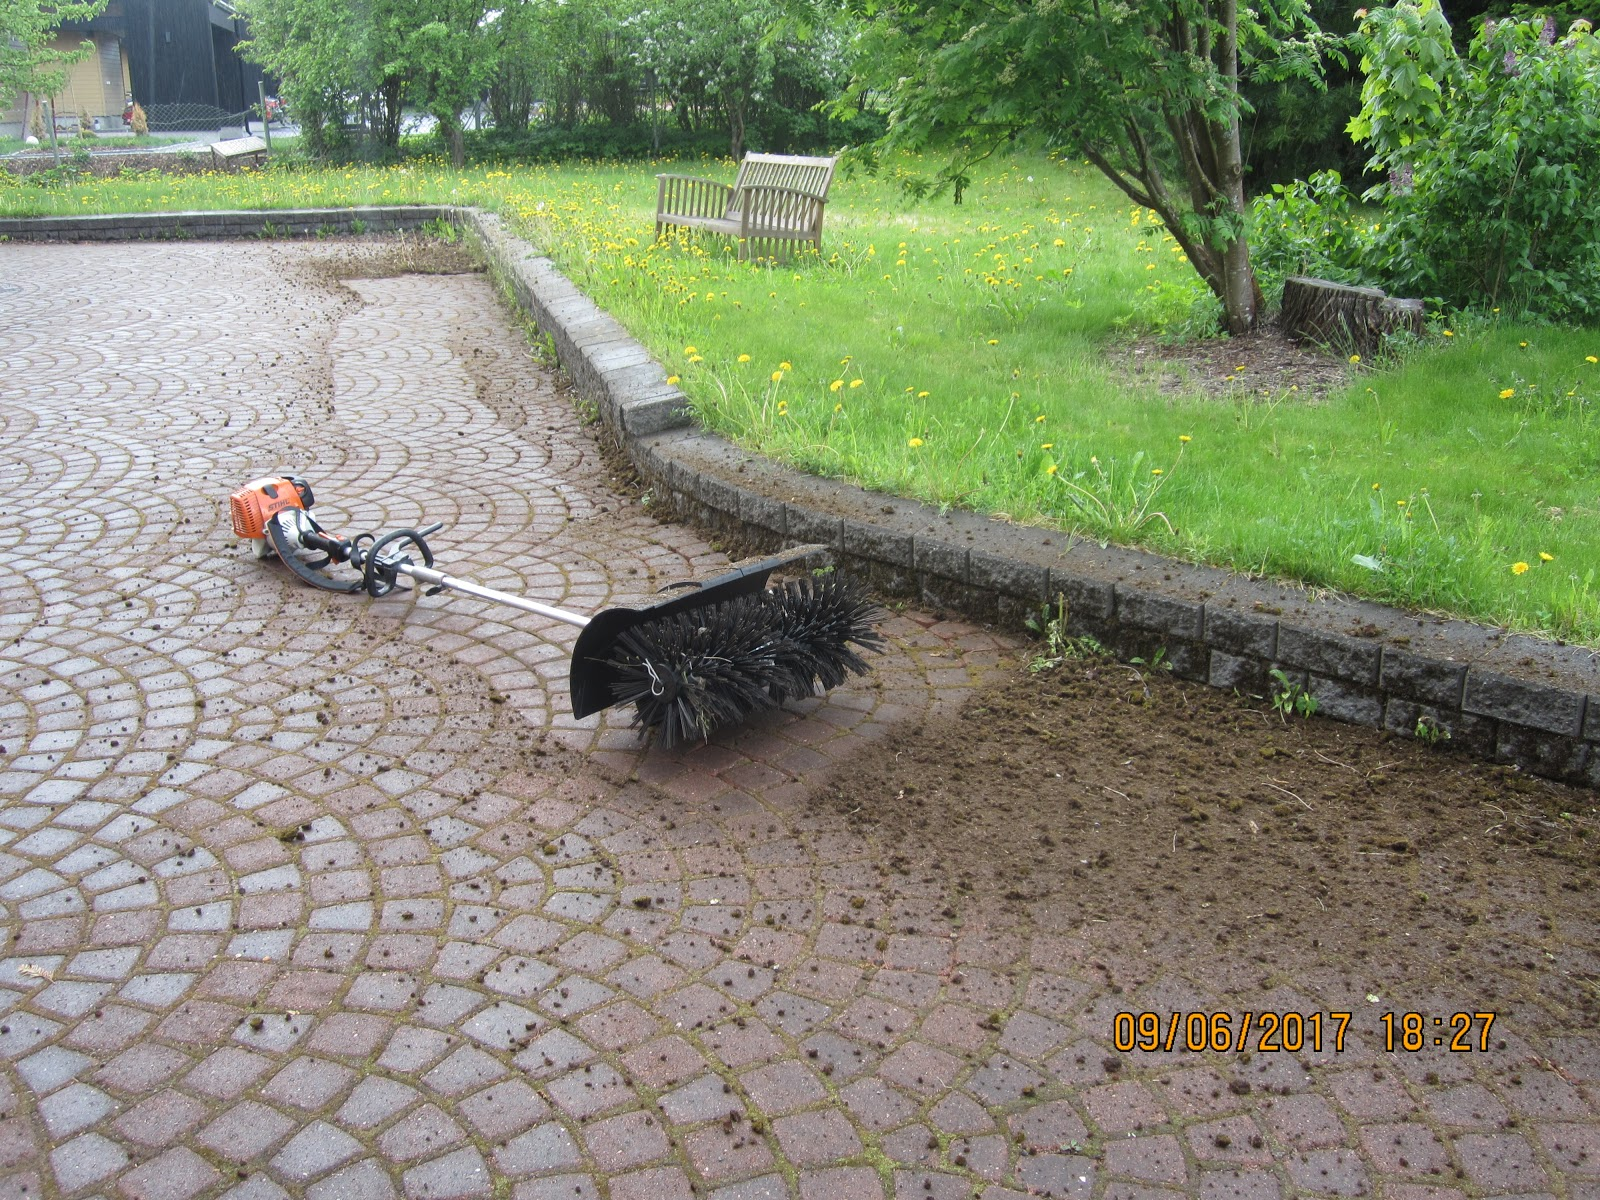 Katujen ja pihojen harjaukset stihlin kombikoneella Talonmiespalvelu@gmail.com Tampere Pirkanmaa